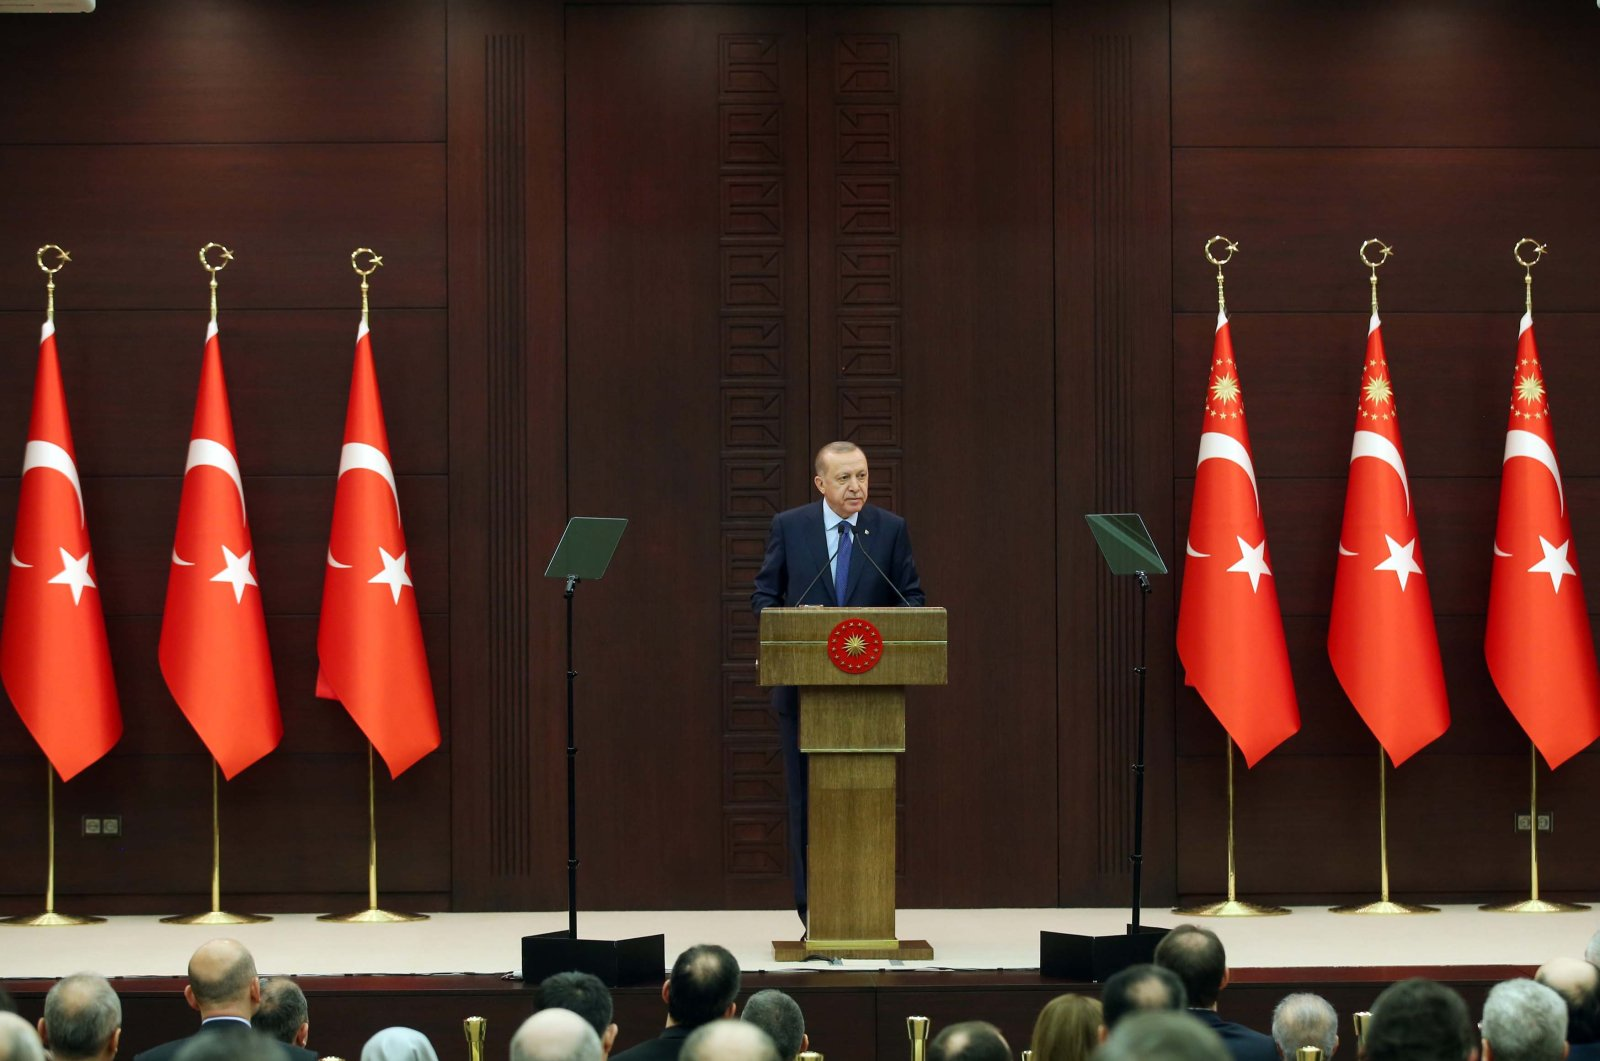 President Recep Tayyip Erdoğan speaks during a news conference following a coronavirus disease (COVID-19) meeting, Ankara, Turkey, Wednesday, March 18, 2020. (AA Photo)